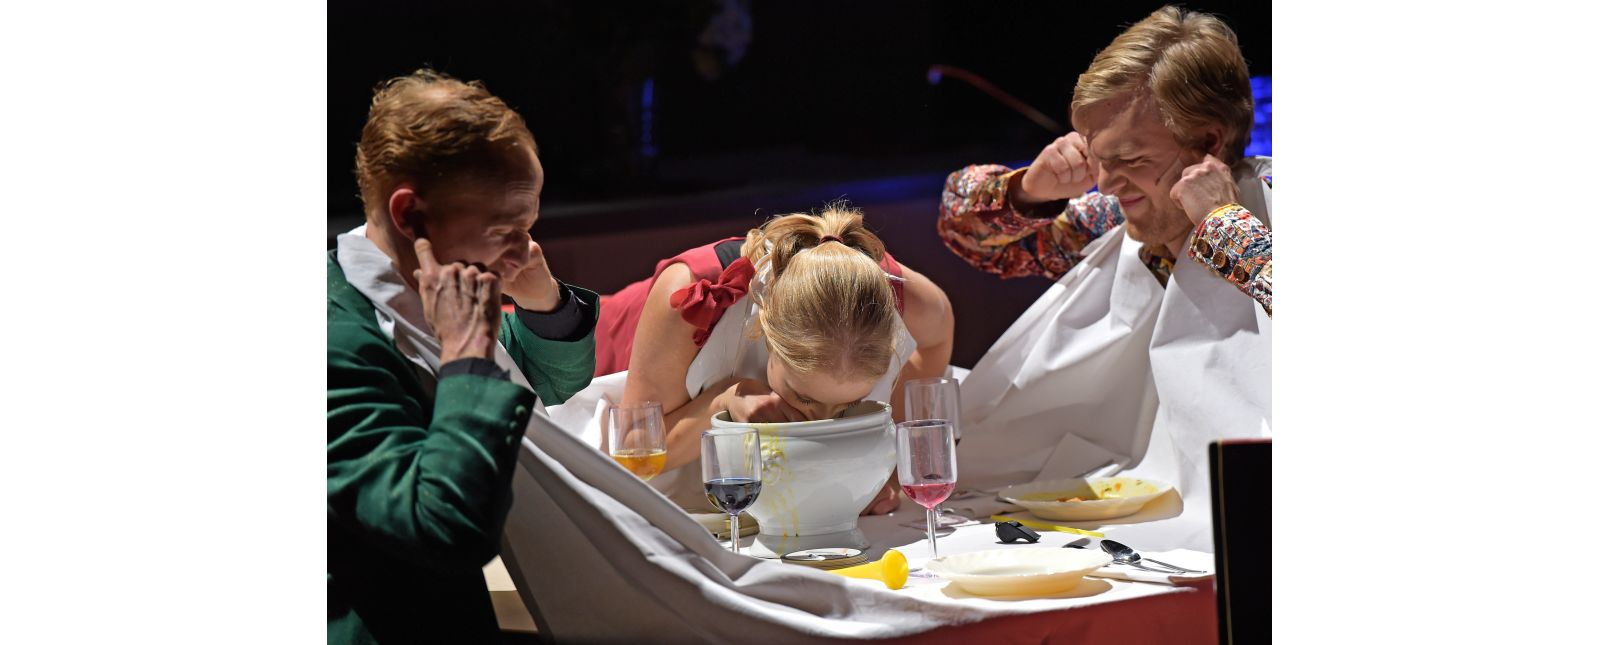 Teufels Küche // Philipp Schiemenz, Mariella Bachmann, Justin Auer // 2017 // Foto: Maurice Korbel